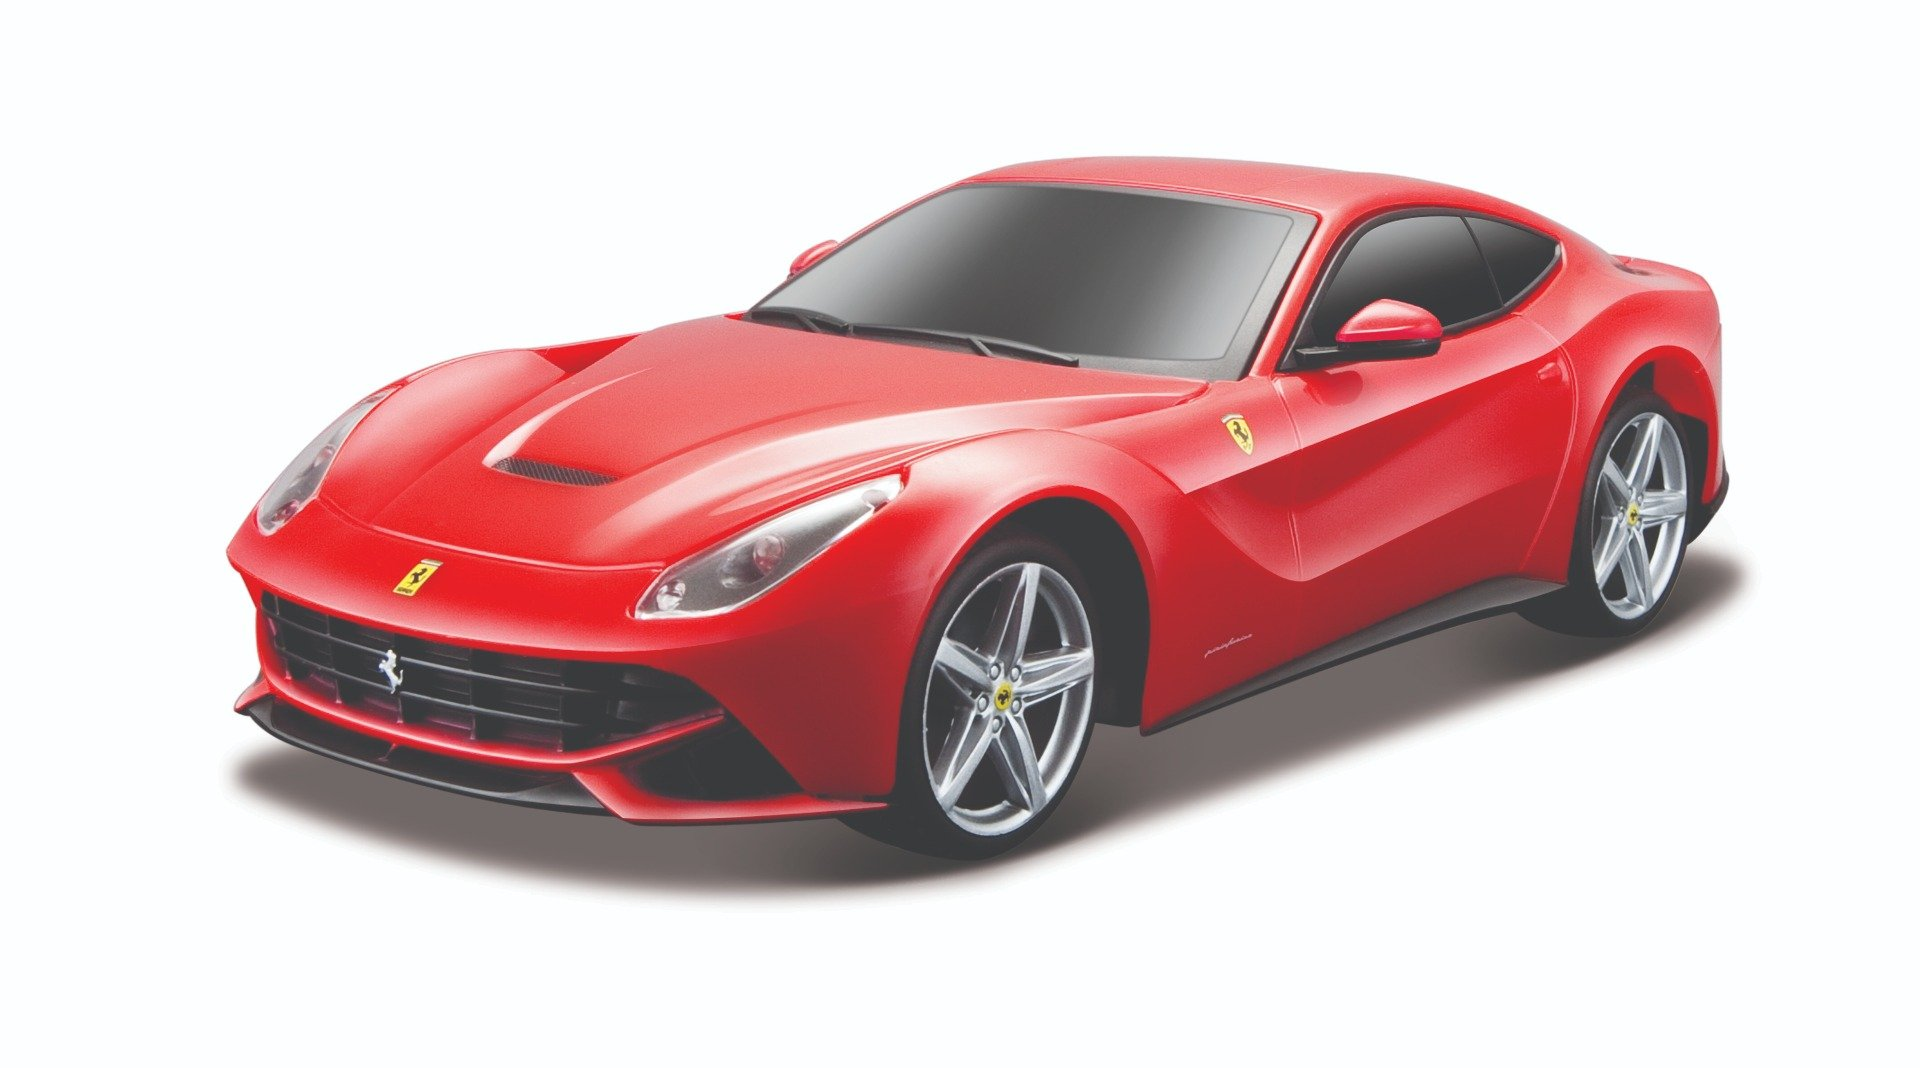 Masinuta Maisto Ferrari F12 Berlinetta, 1:24